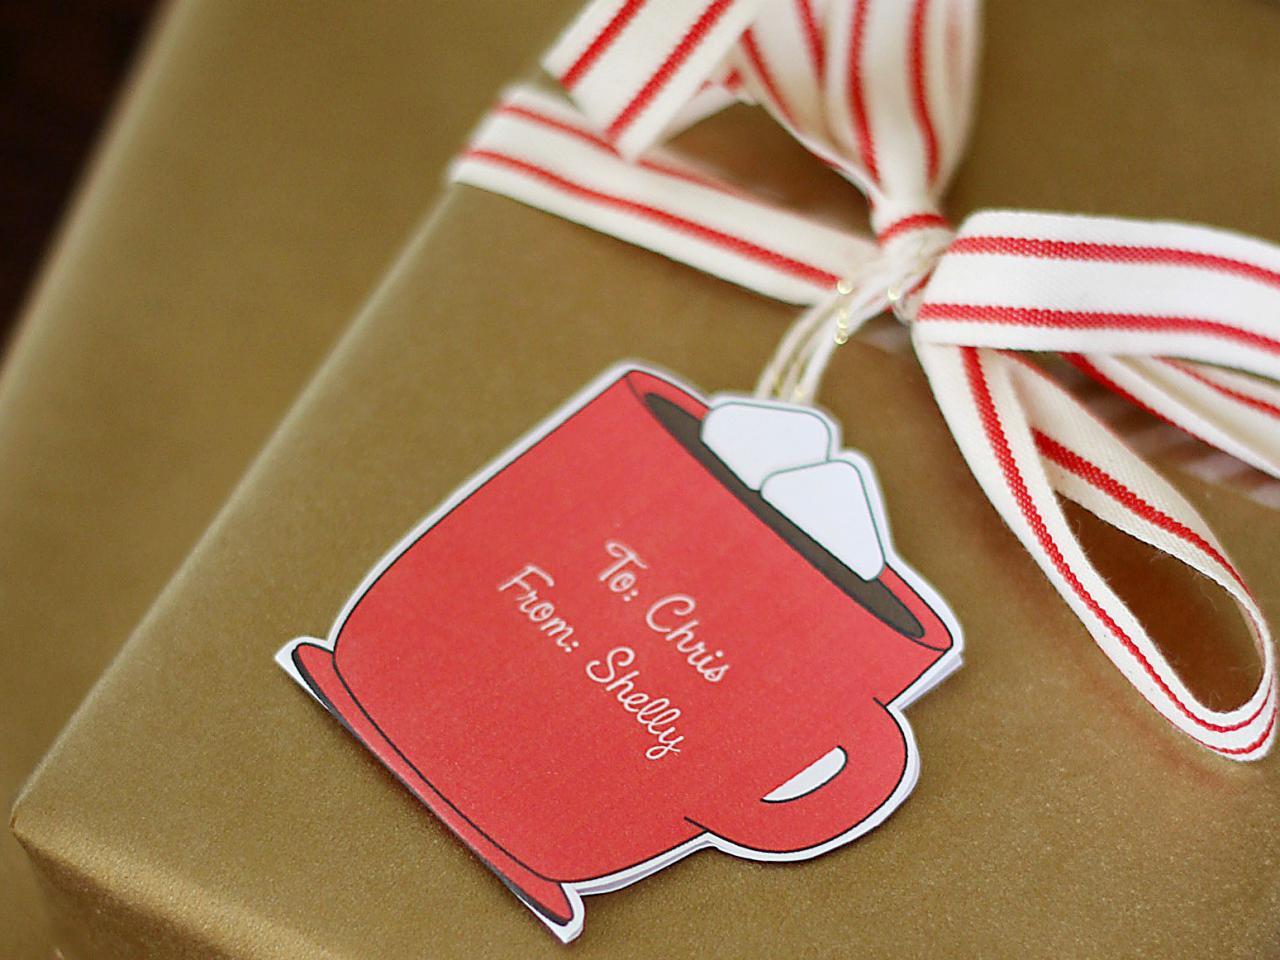 CI-Kori-Clark_Christmas-Gift-Tag-Hot-Cocoa2_h.jpg.rend.hgtvcom.1280.960